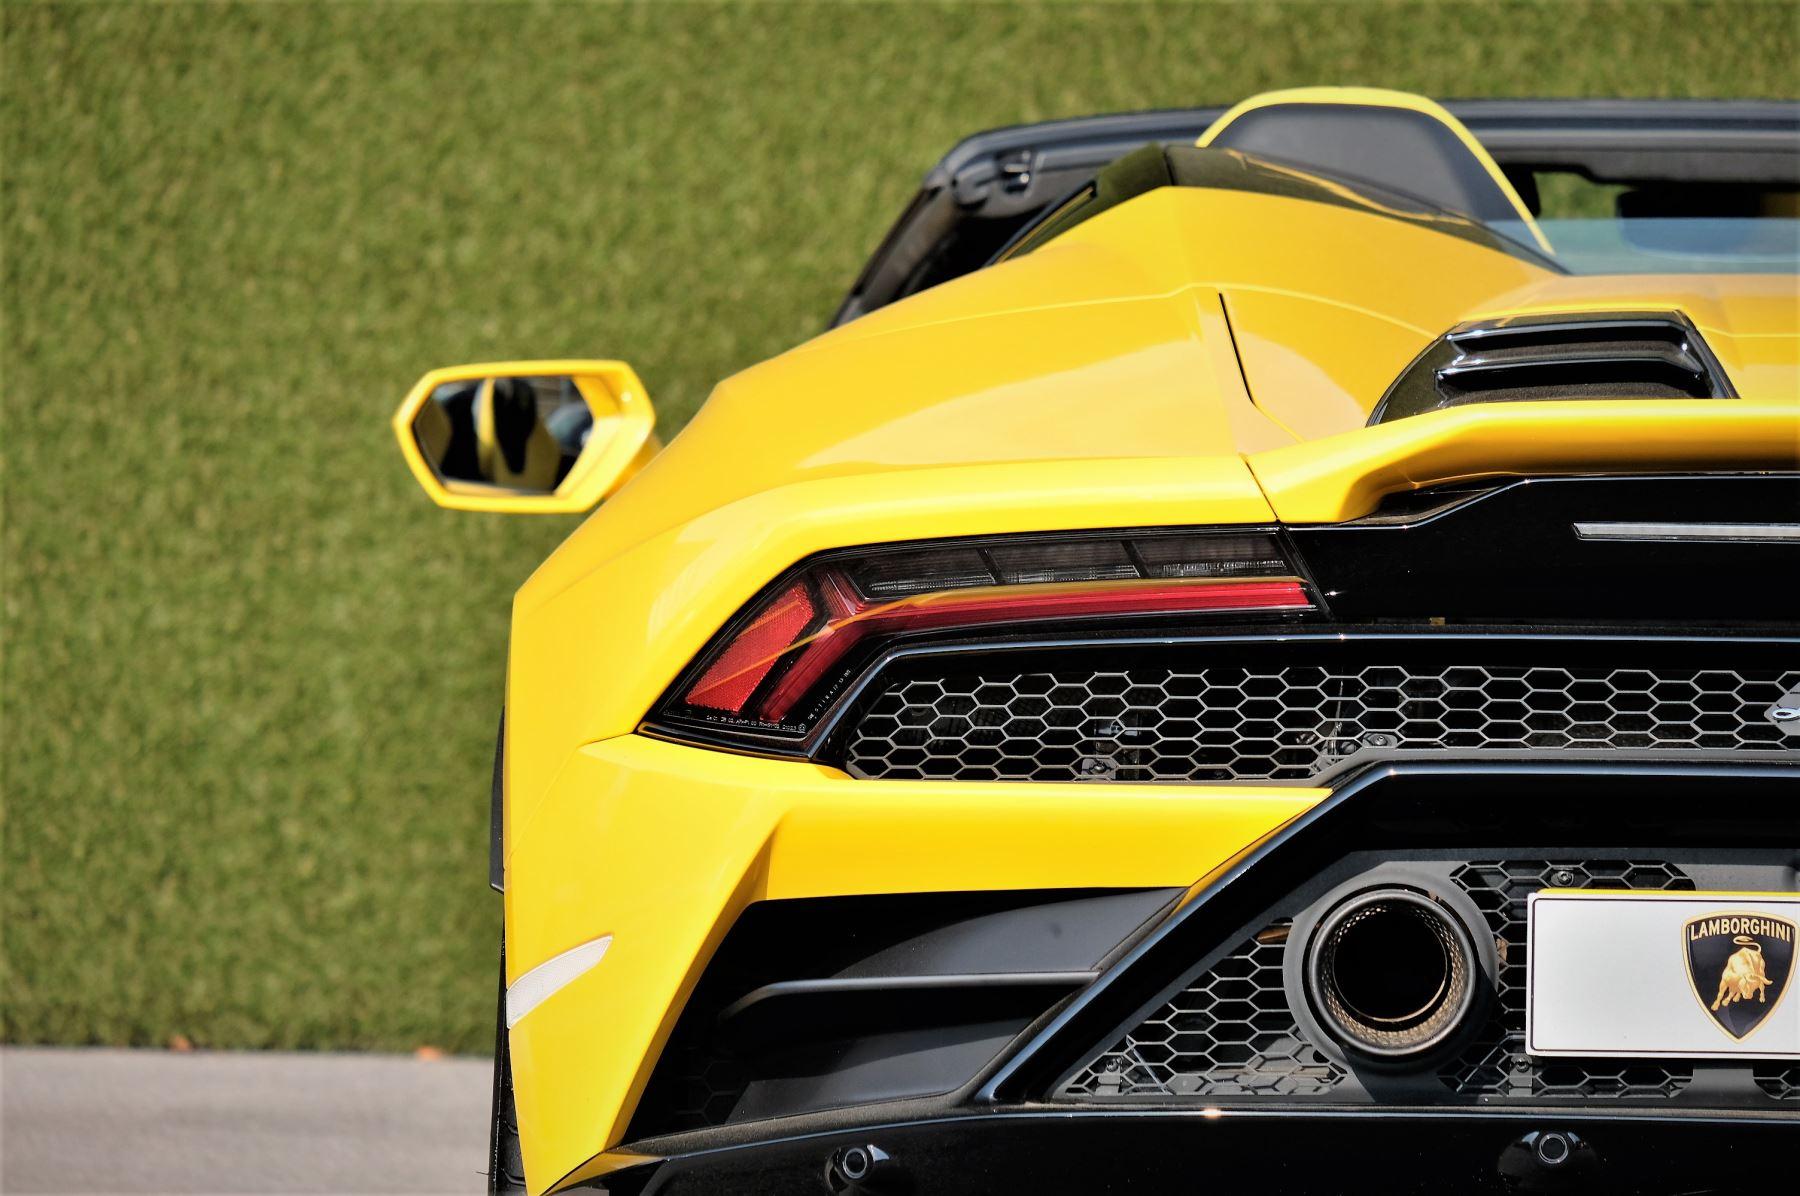 Lamborghini Huracan EVO Spyder LP 640-4 image 12